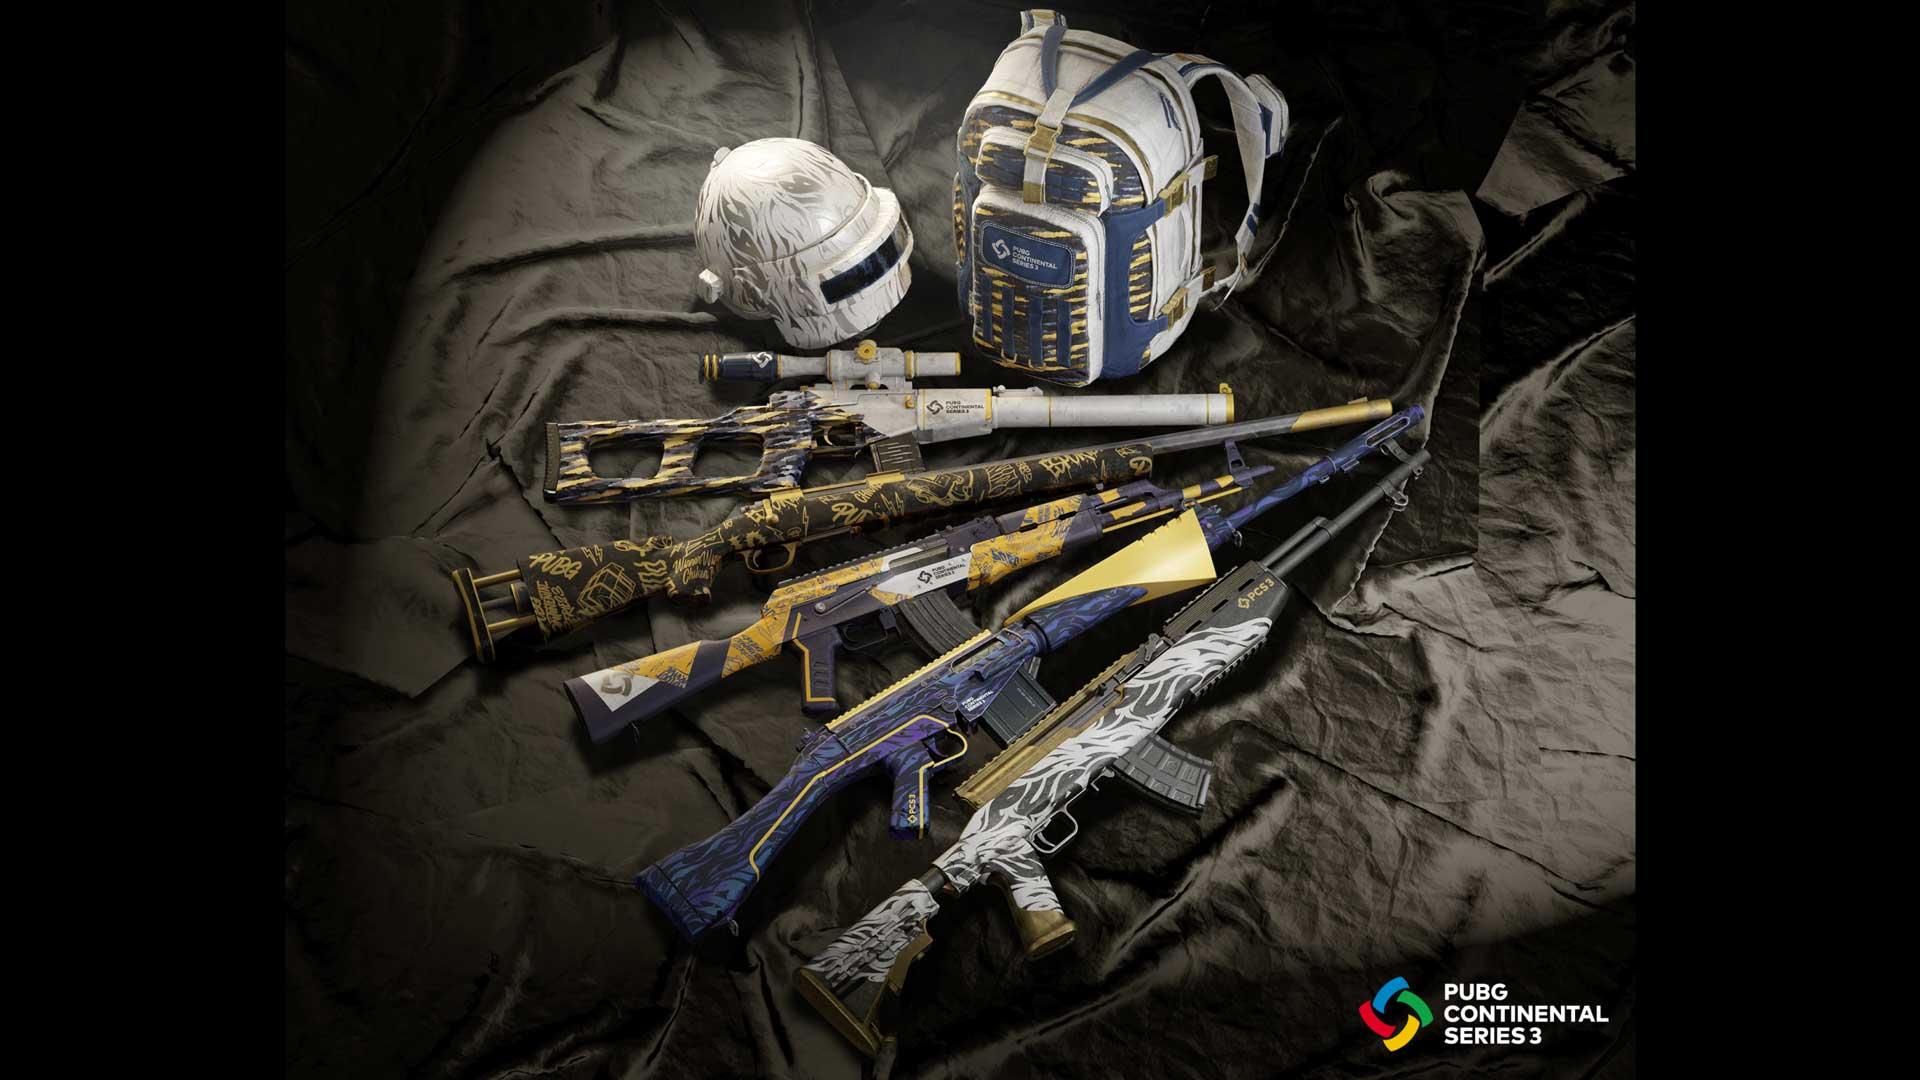 2020 PCS 3 Weapon Gears wlogo opt 1920x1536 babt